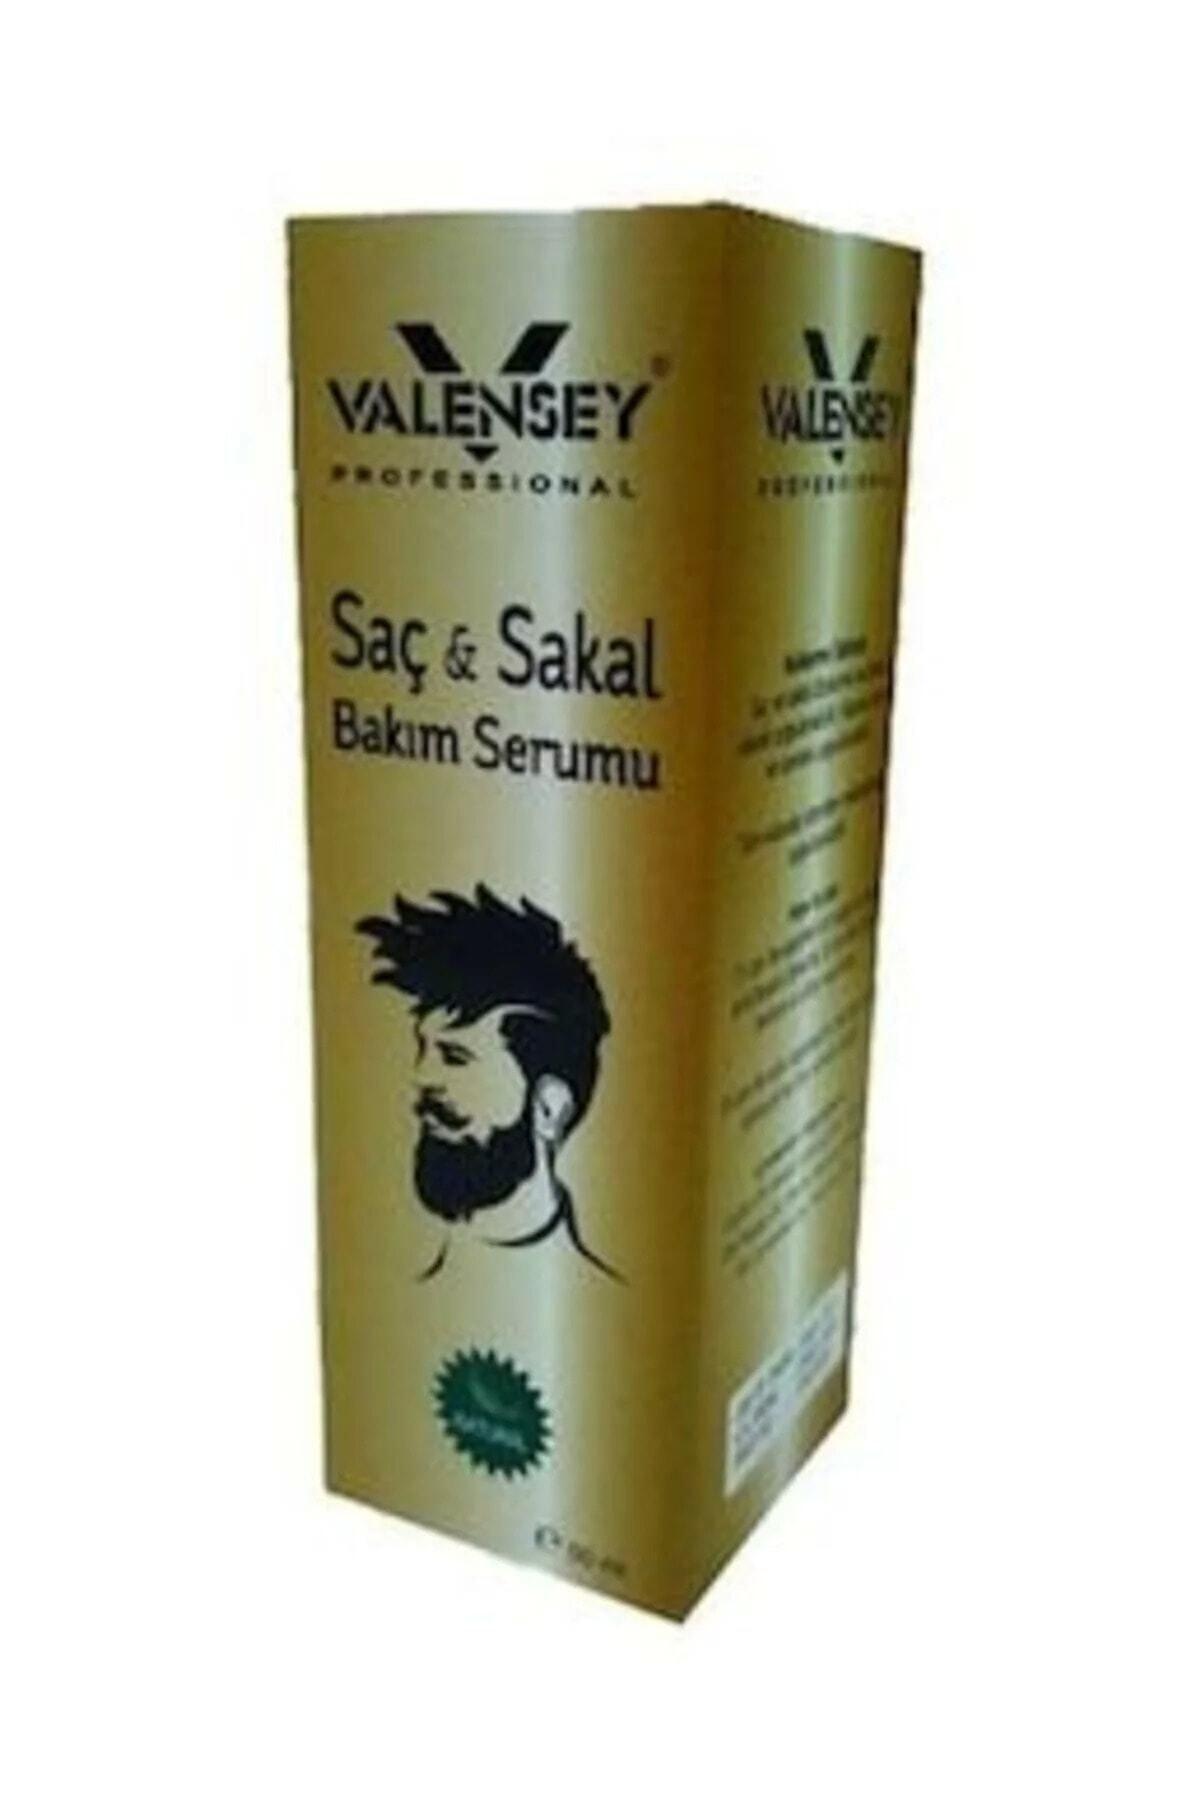 Valensey Valansey Saç&sakal Bakım Serumu 50 ml 1